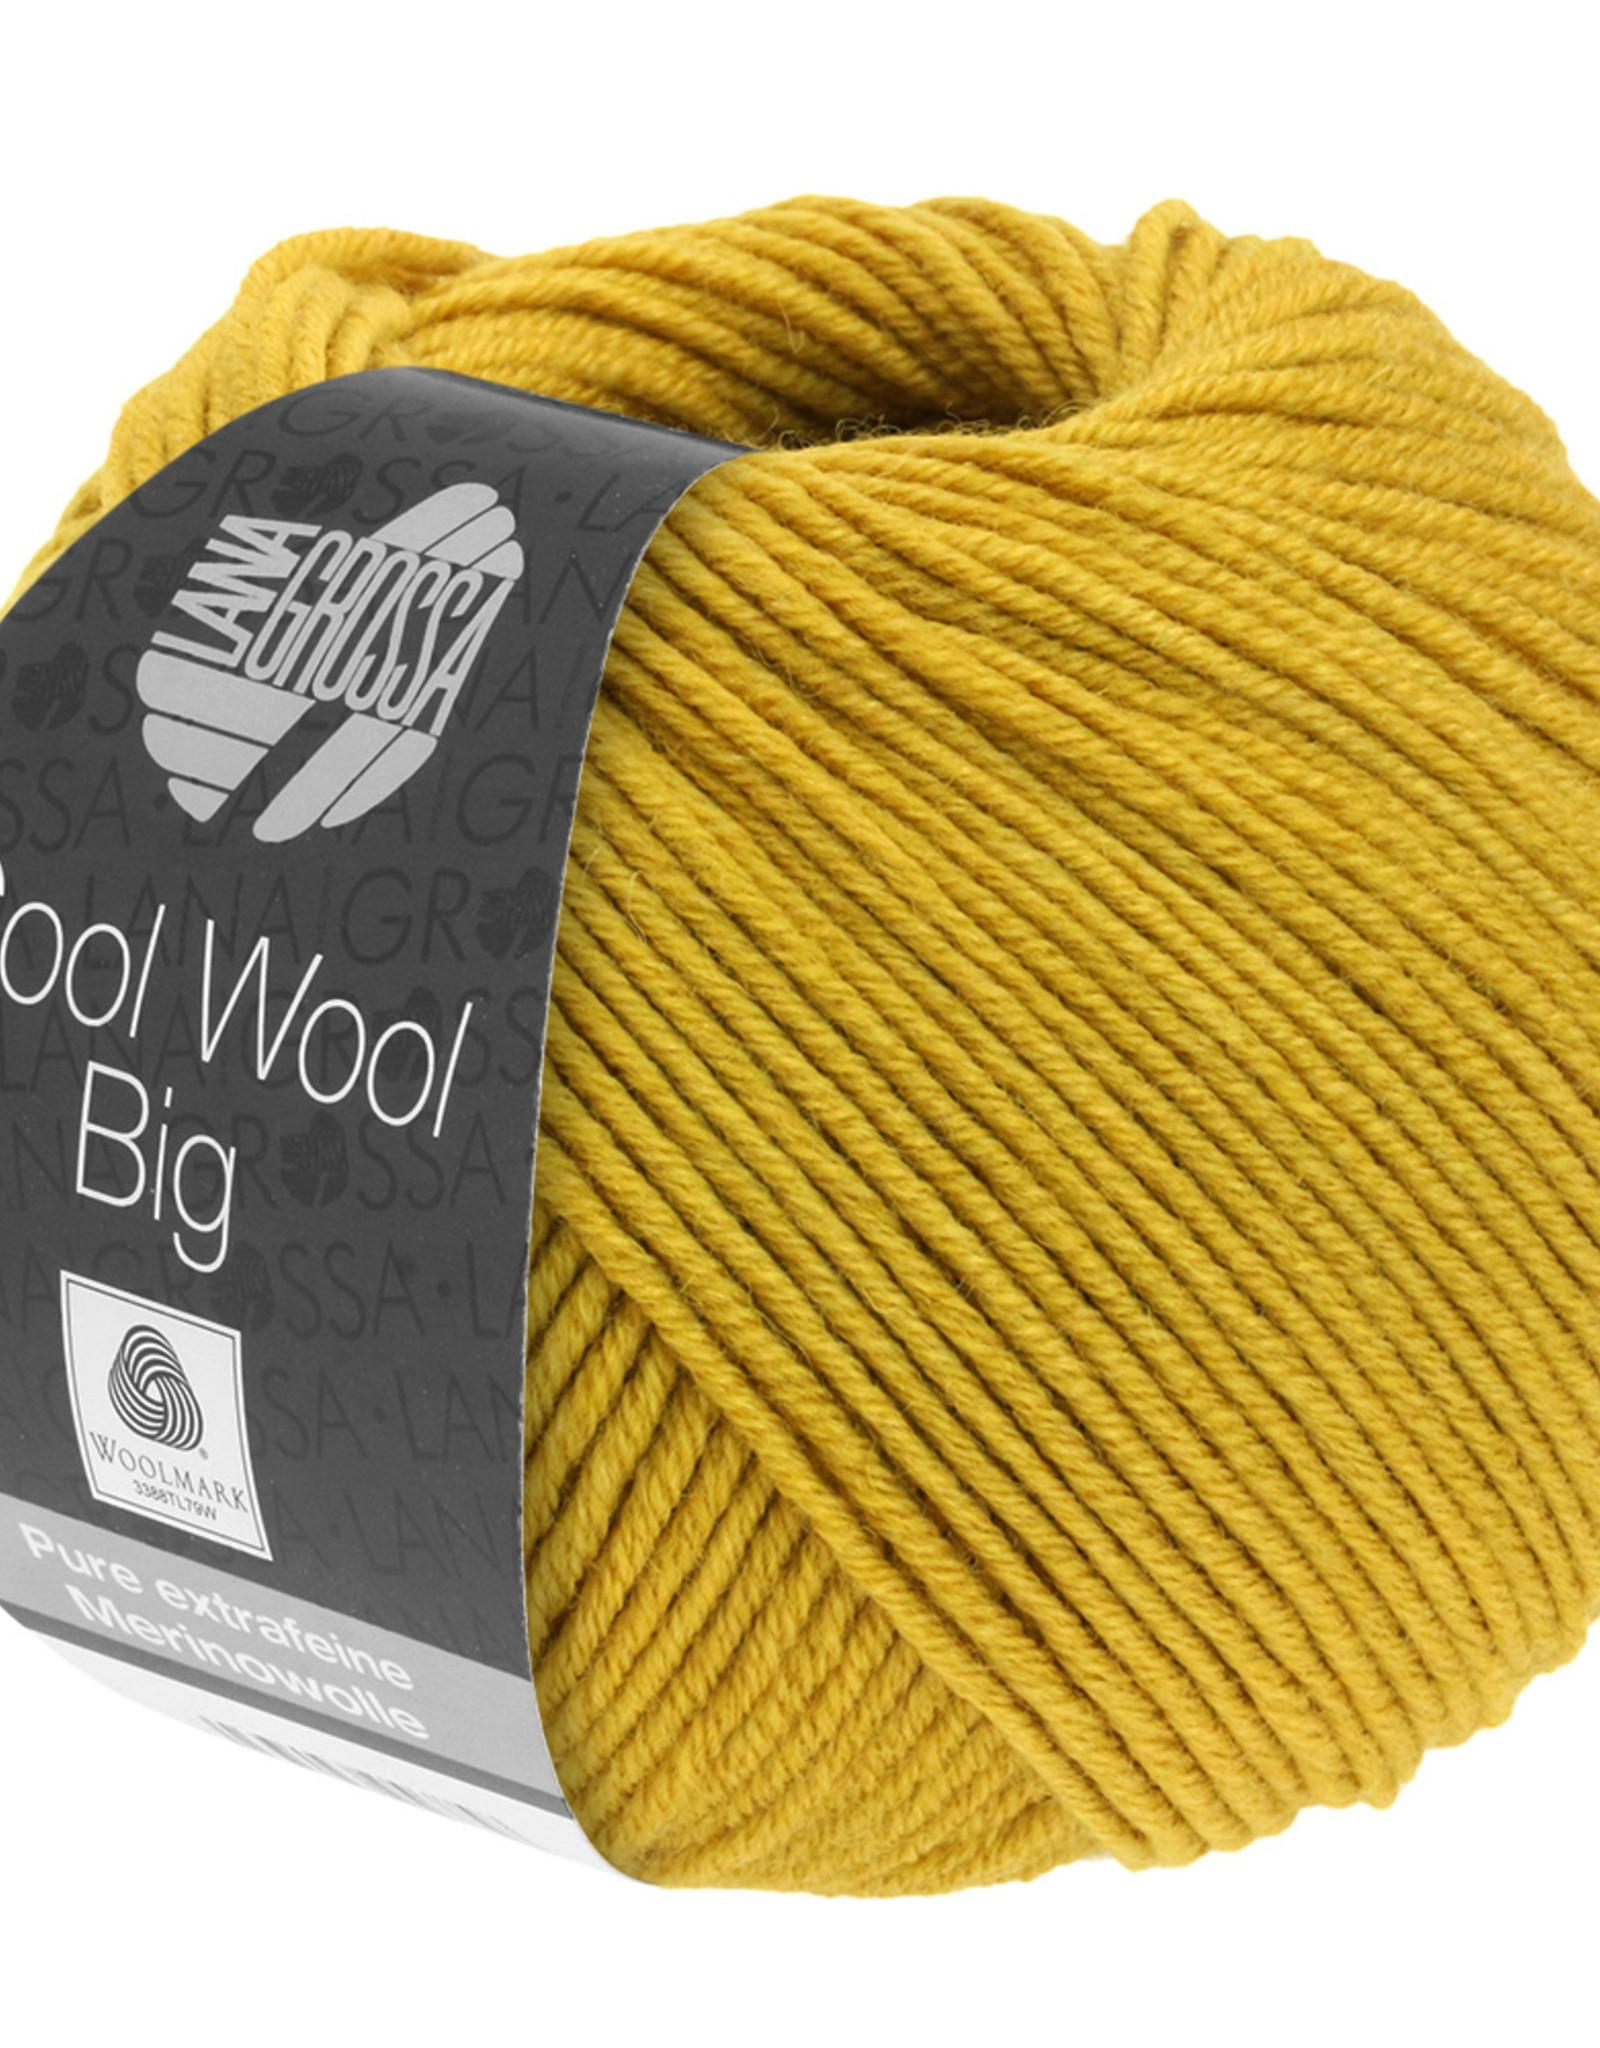 Lana Grossa Cool Wool Big